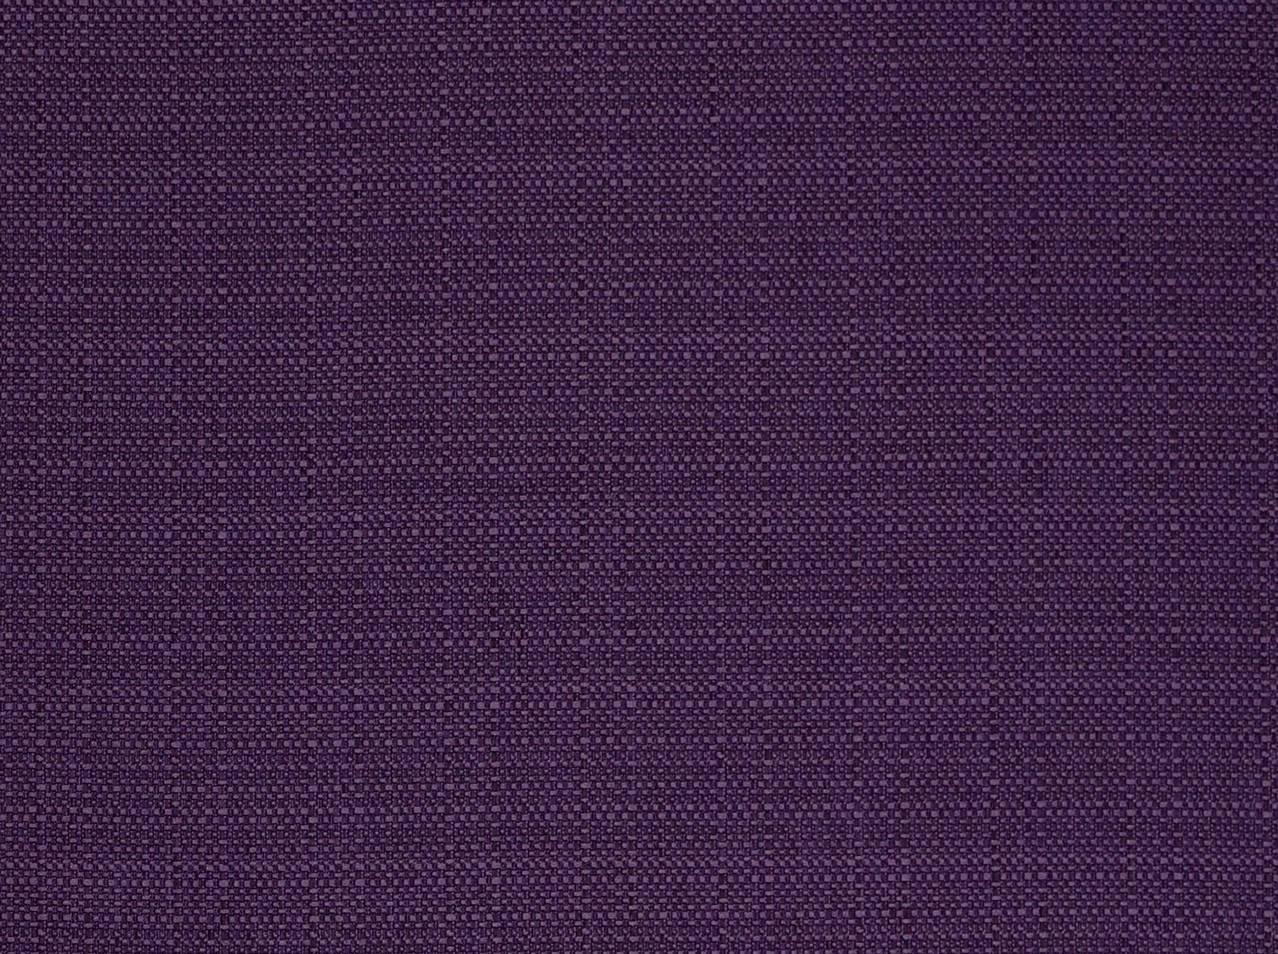 Covington Contract Products Color Plum Expo Purple